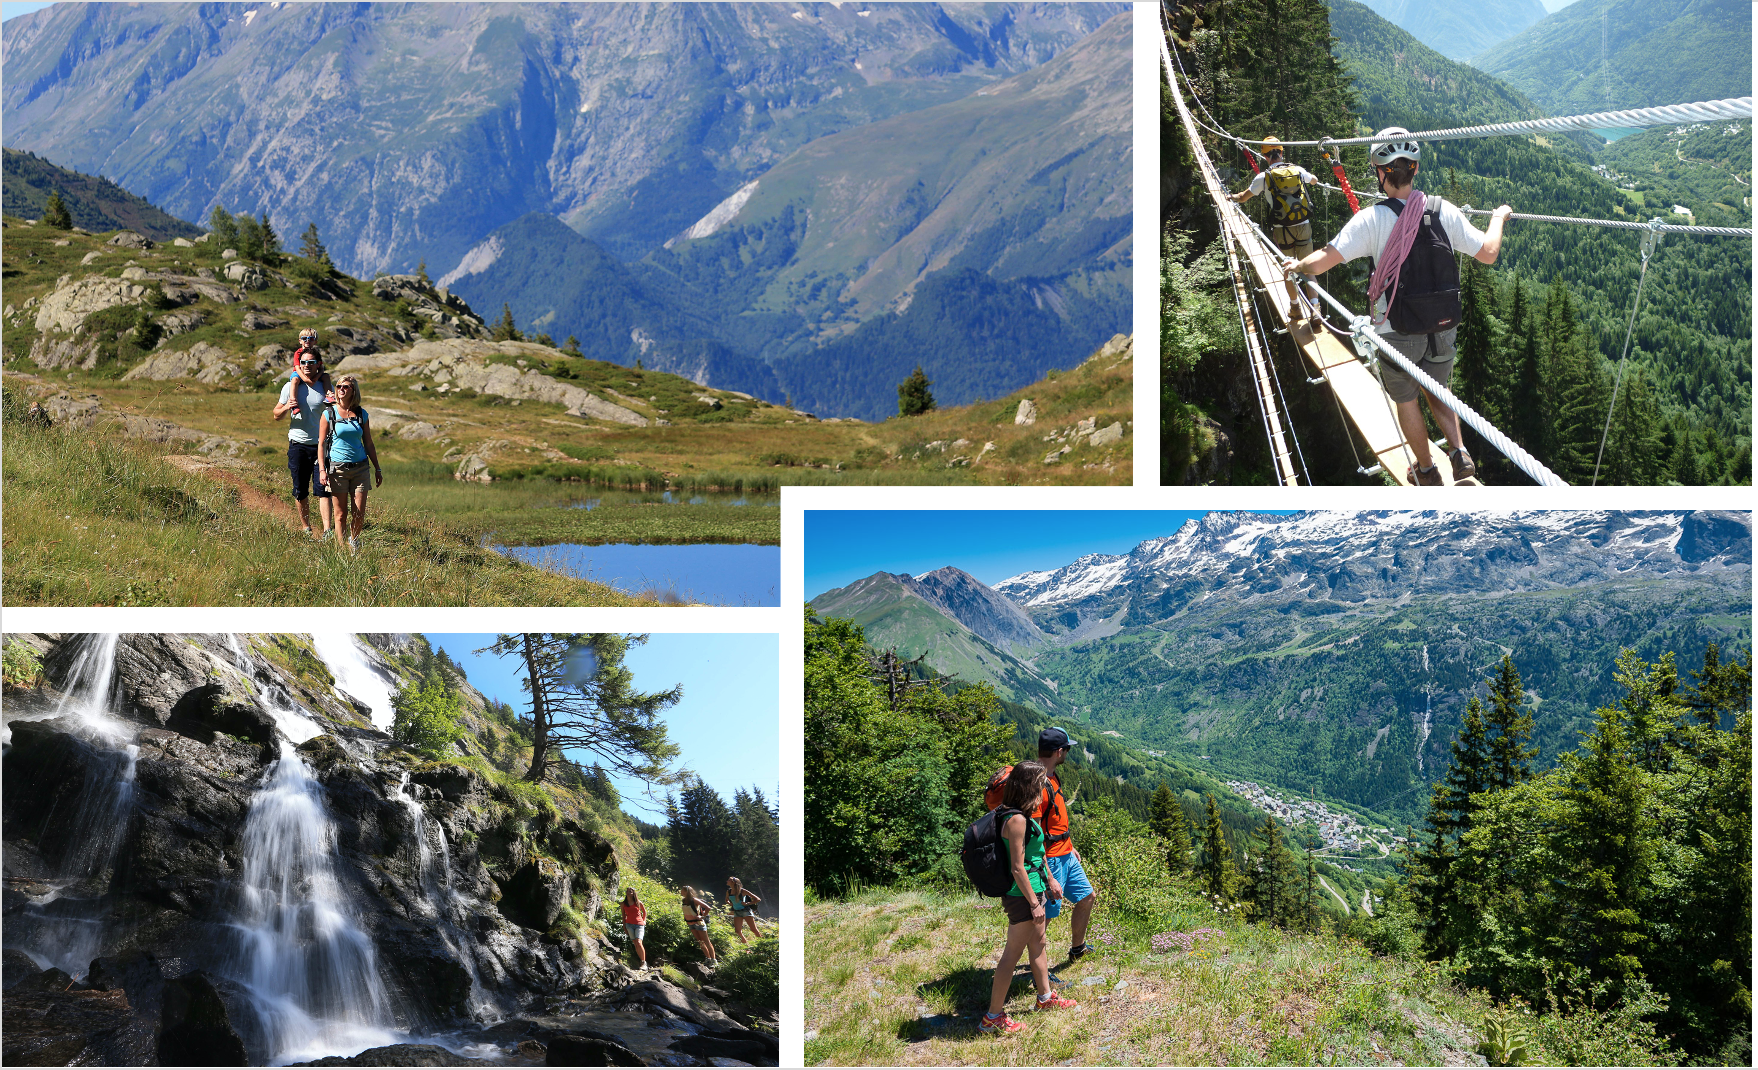 Vacances d'été : Vaujany, un  paradis en Isère Capture%20d%E2%80%99e%CC%81cran%202021-02-22%20a%CC%80%2012.09.16